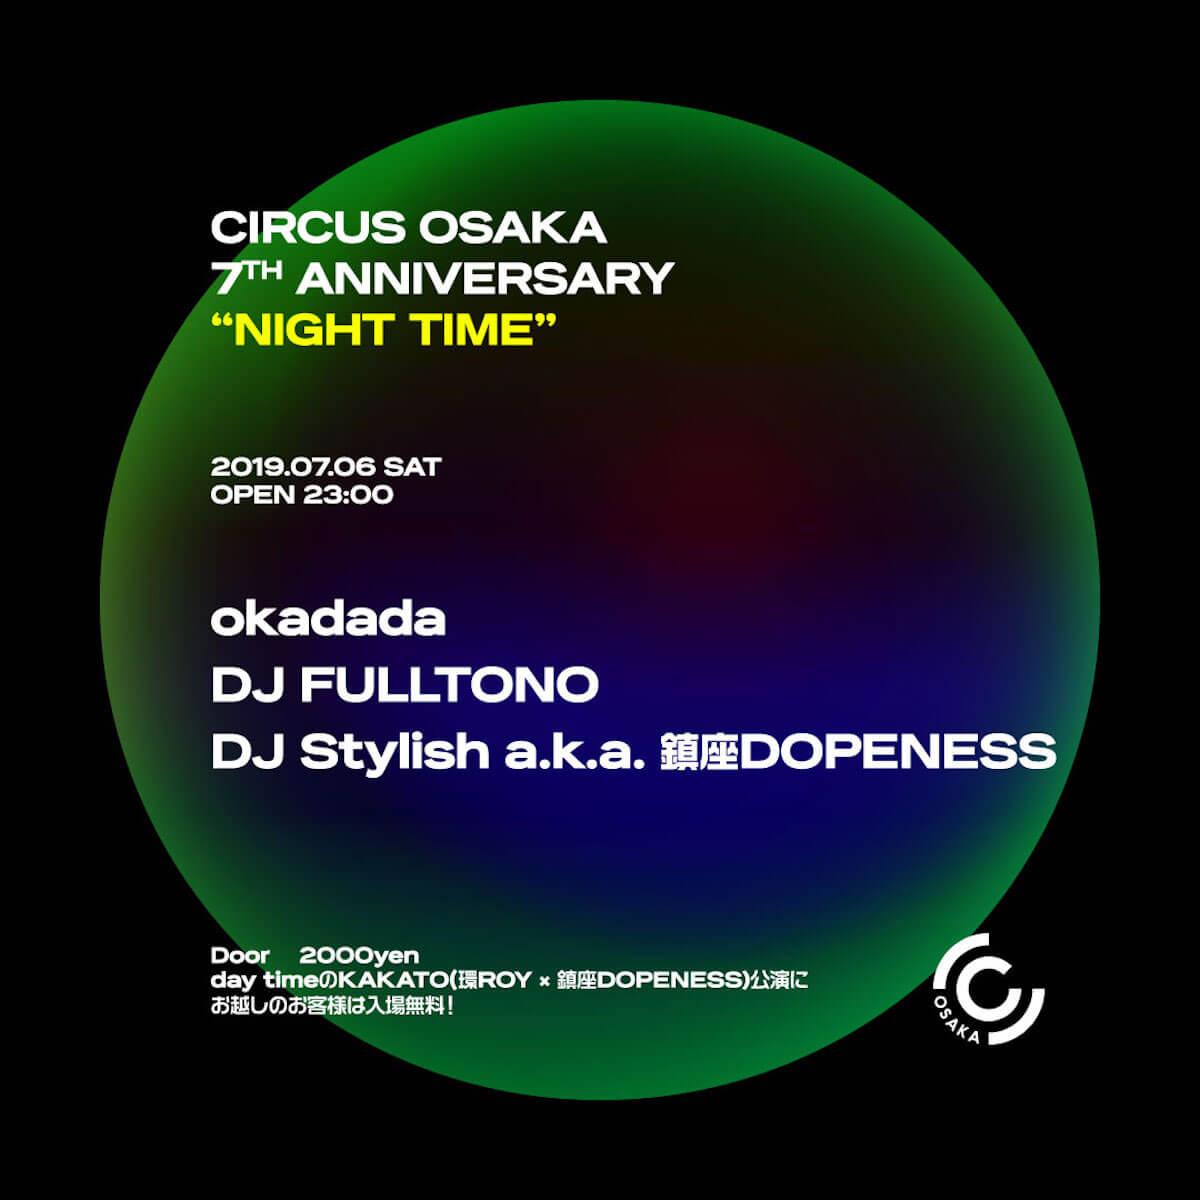 CIRCUS OSAKAが7周年!2日間に渡るアニバーサリーパーティーを開催 KAKATO、okadada、DJ FULLTONOらがラインナップに 2019-07-05_06_CIRCUS-Osaka-7th-ANNIVESARY-01-03A